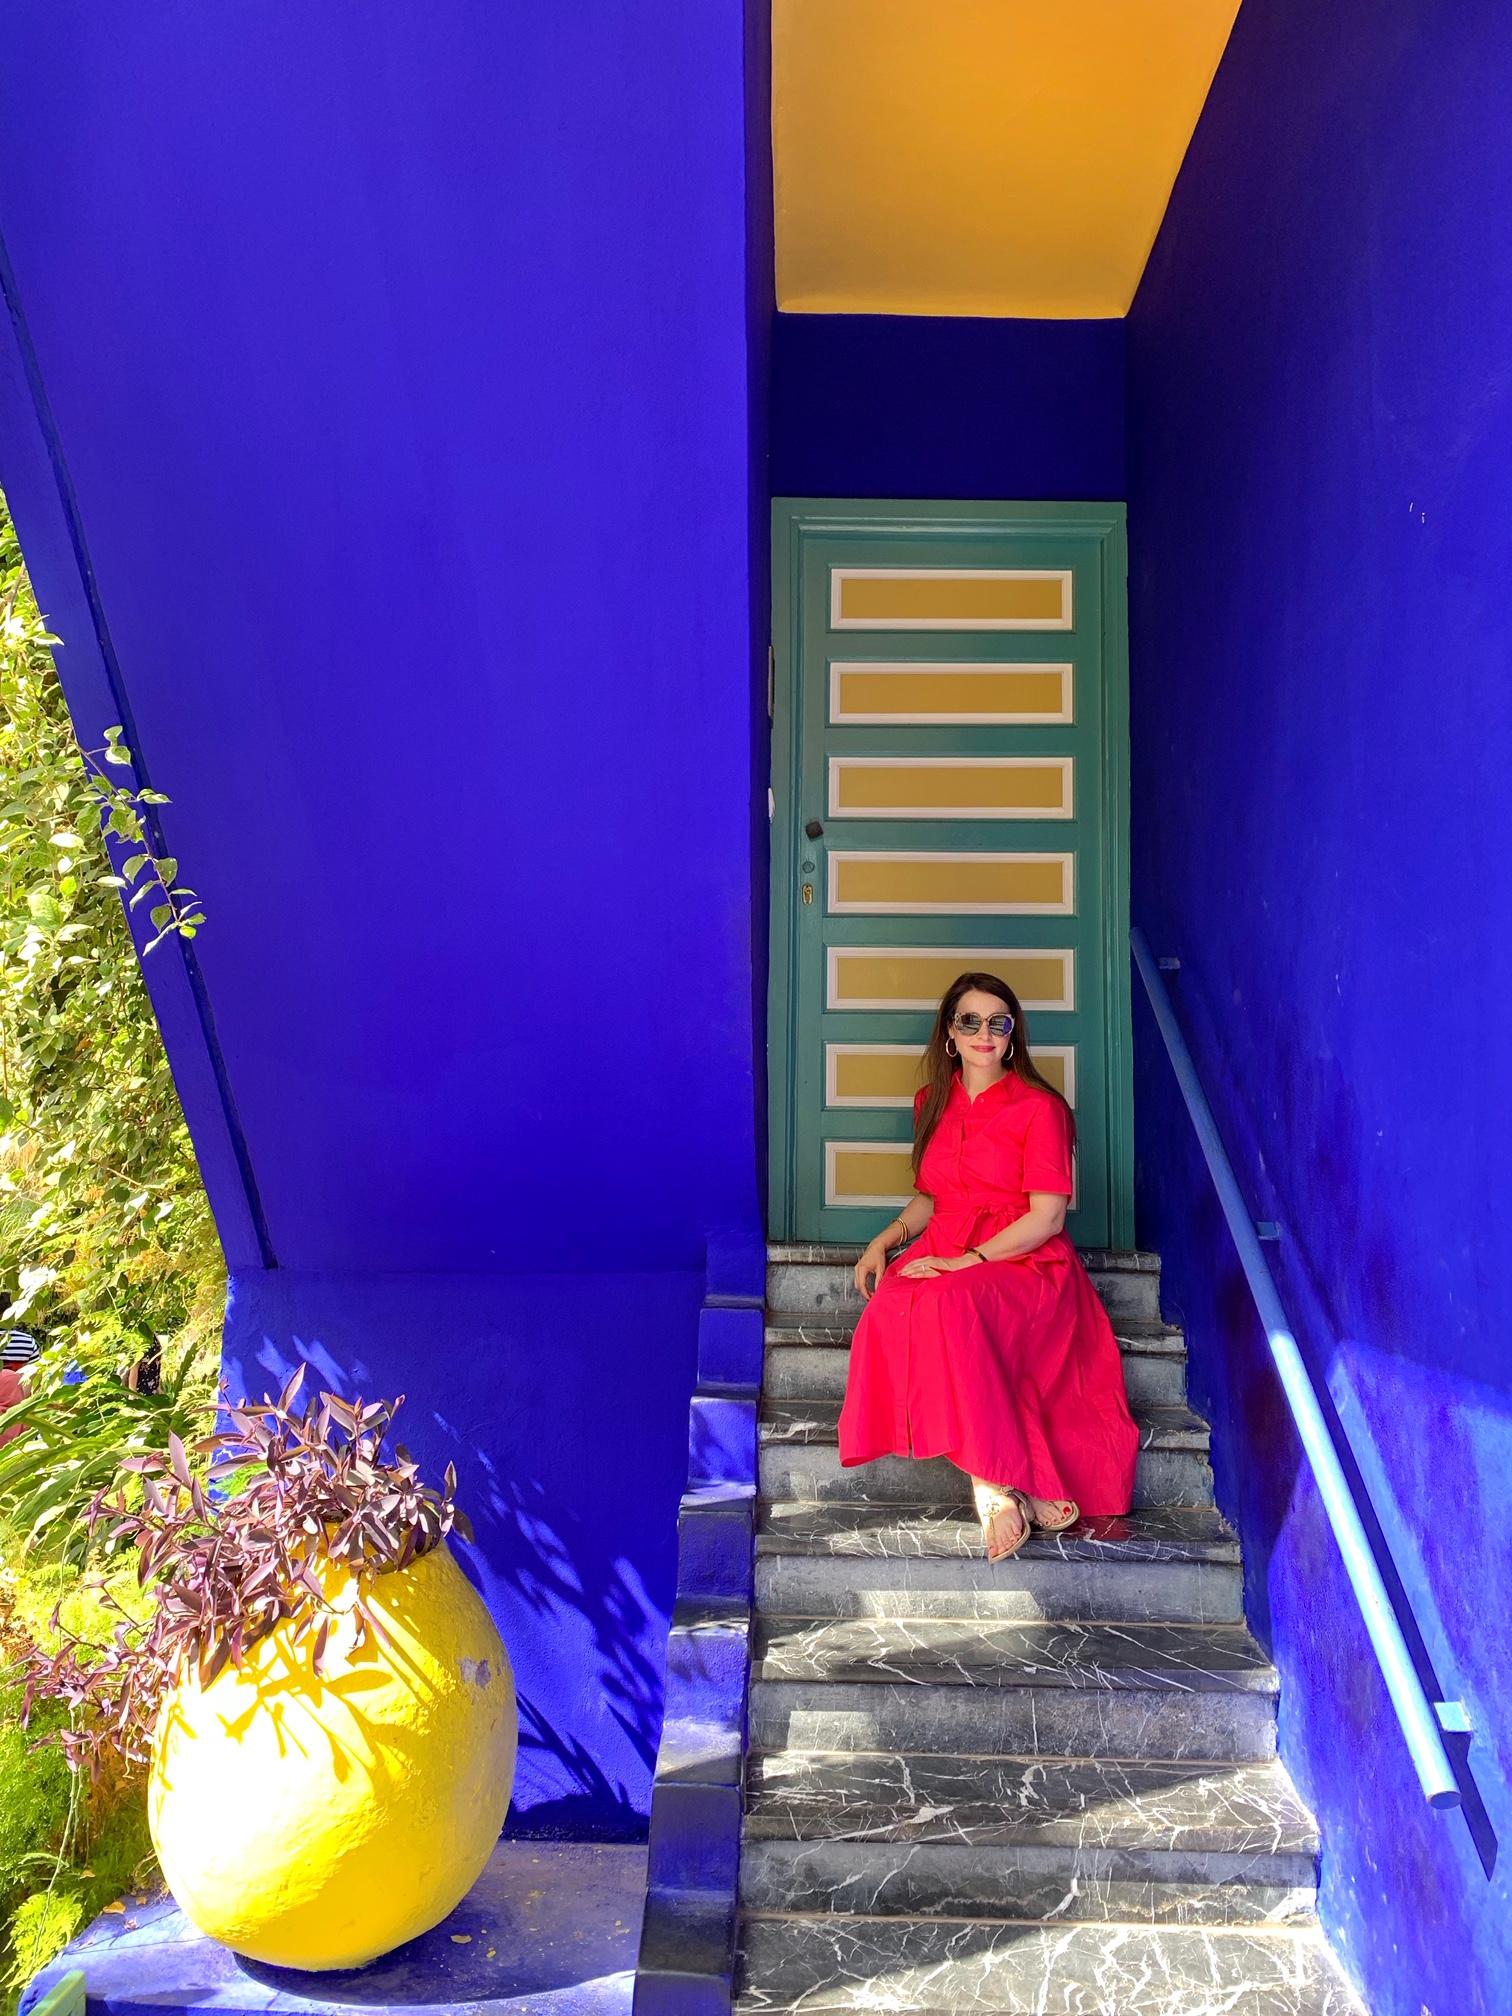 jardin majorelle, ysl museum marrakech, the-alyst.com